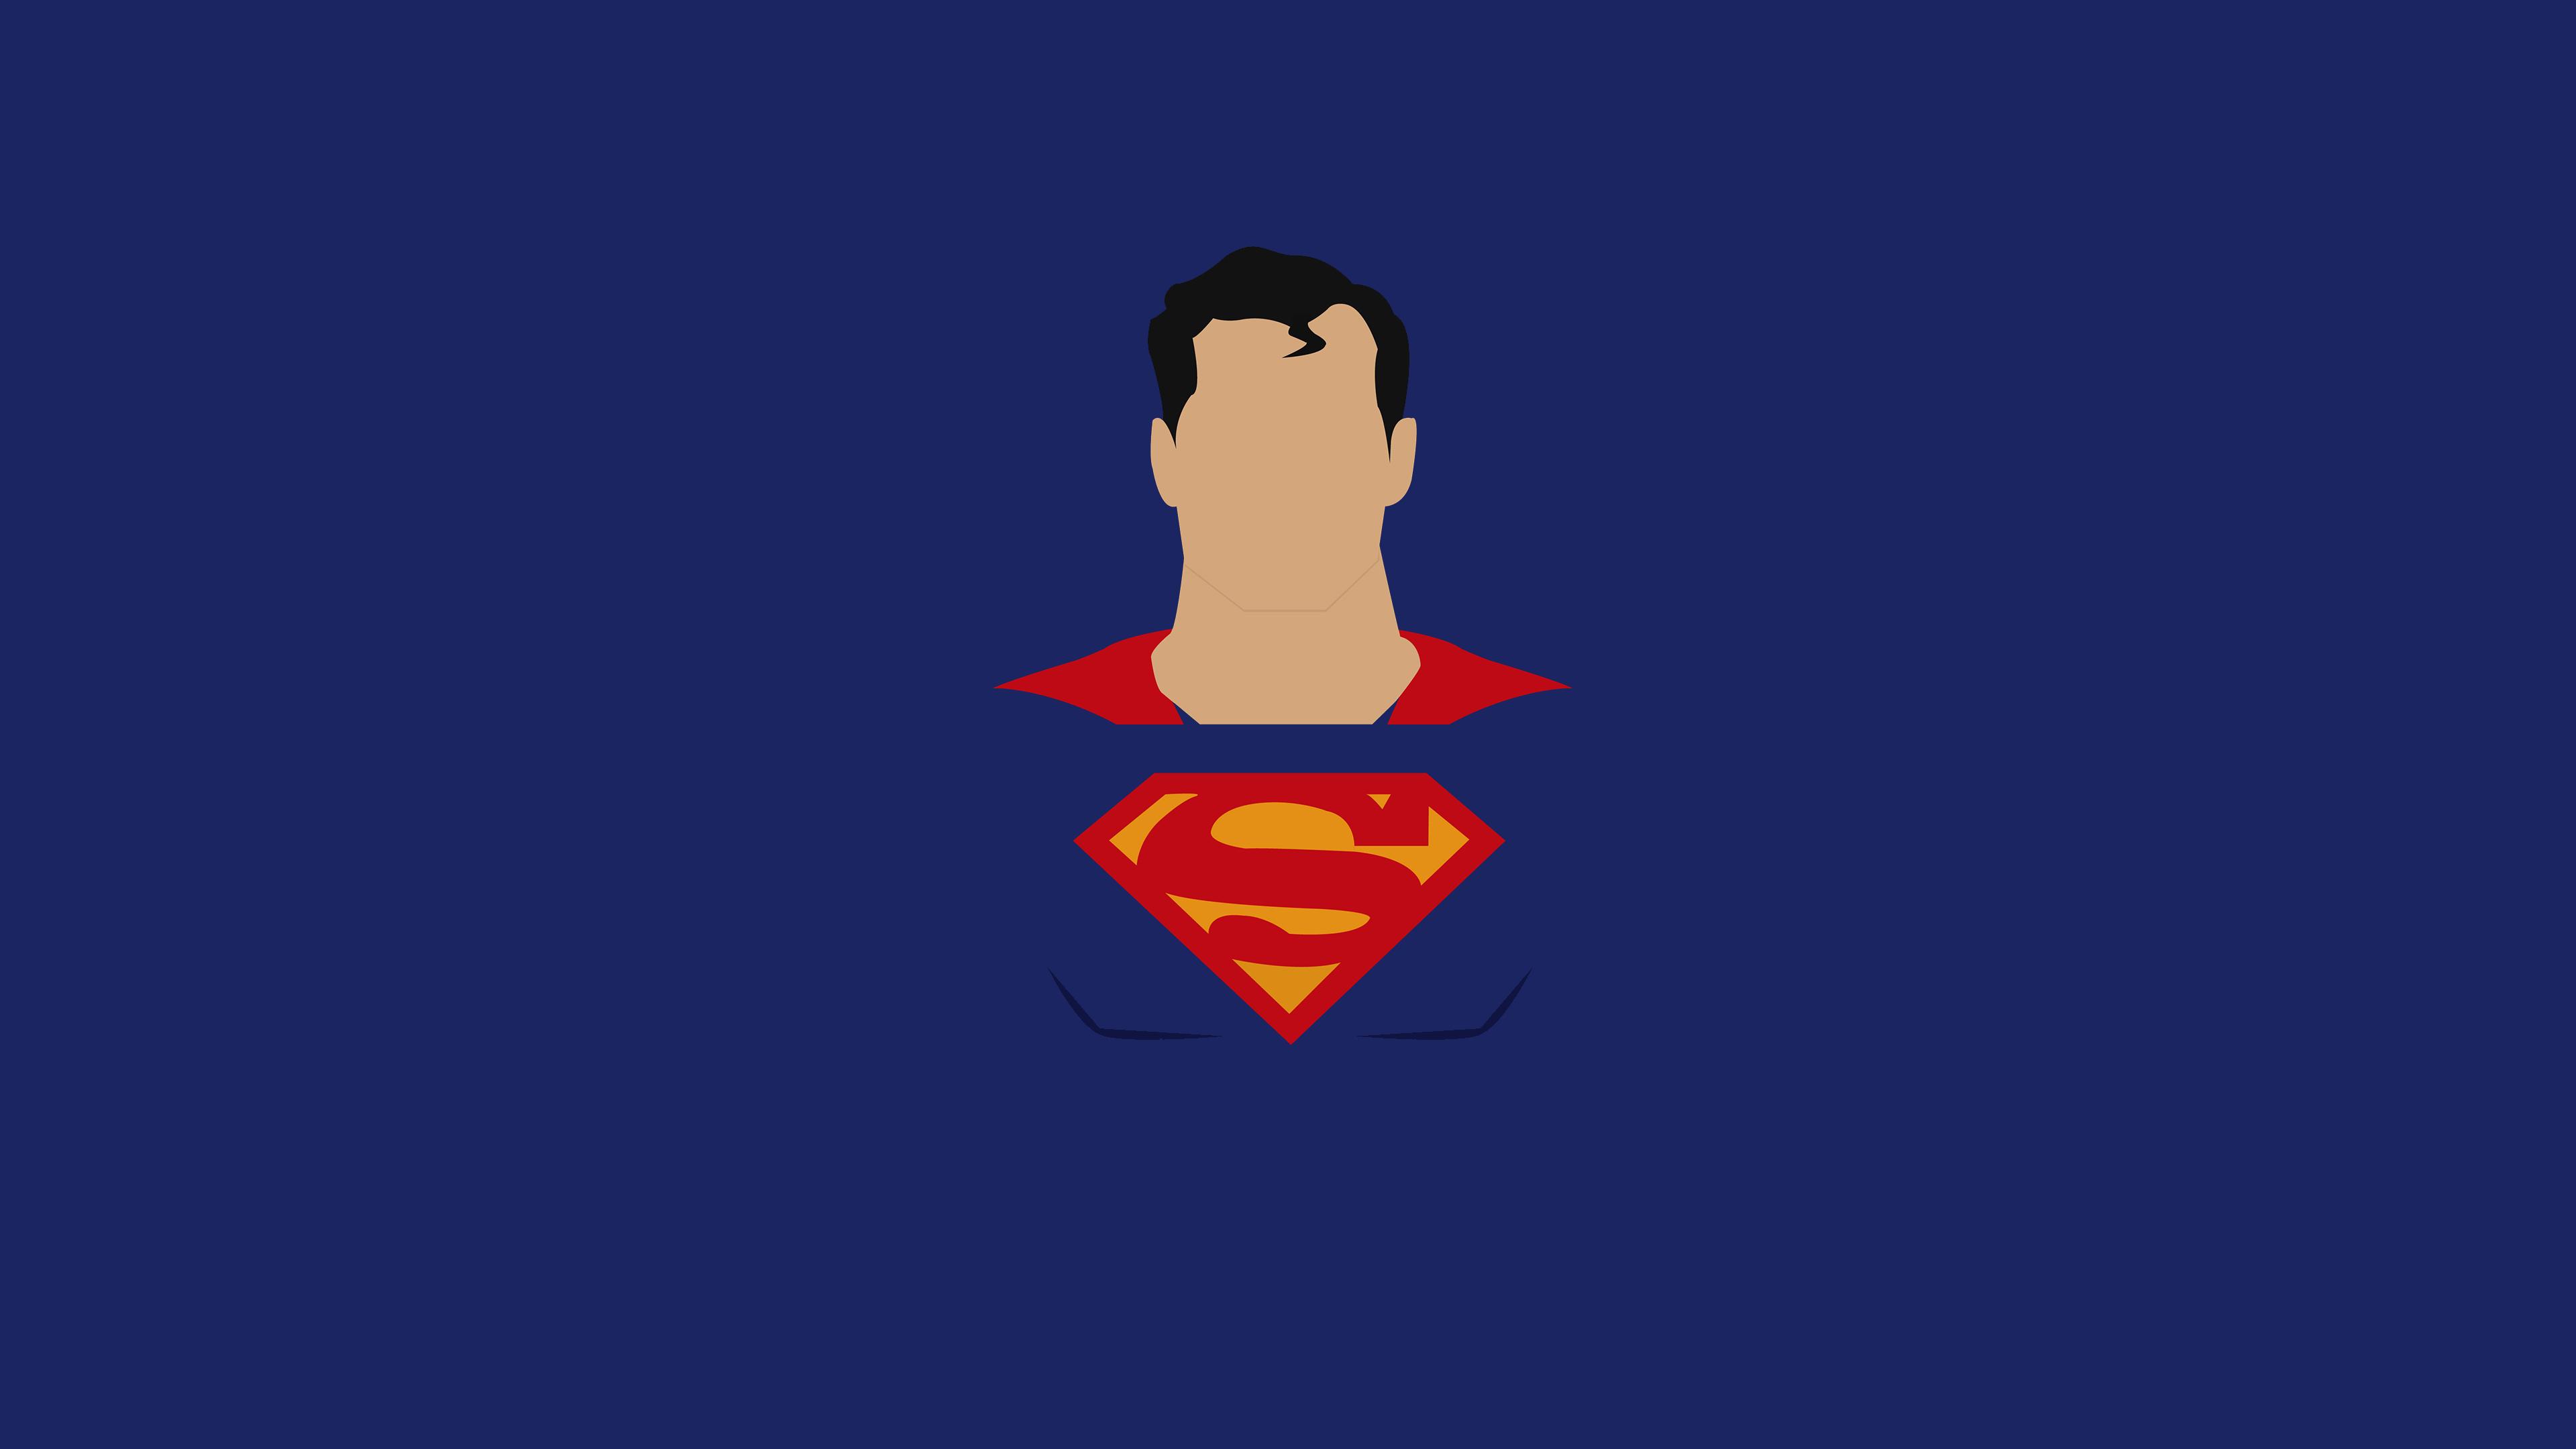 superman minimalism art 4k 1547936495 - Superman Minimalism Art 4k - superman wallpapers, superheroes wallpapers, hd-wallpapers, digital art wallpapers, behance wallpapers, artwork wallpapers, artist wallpapers, 4k-wallpapers